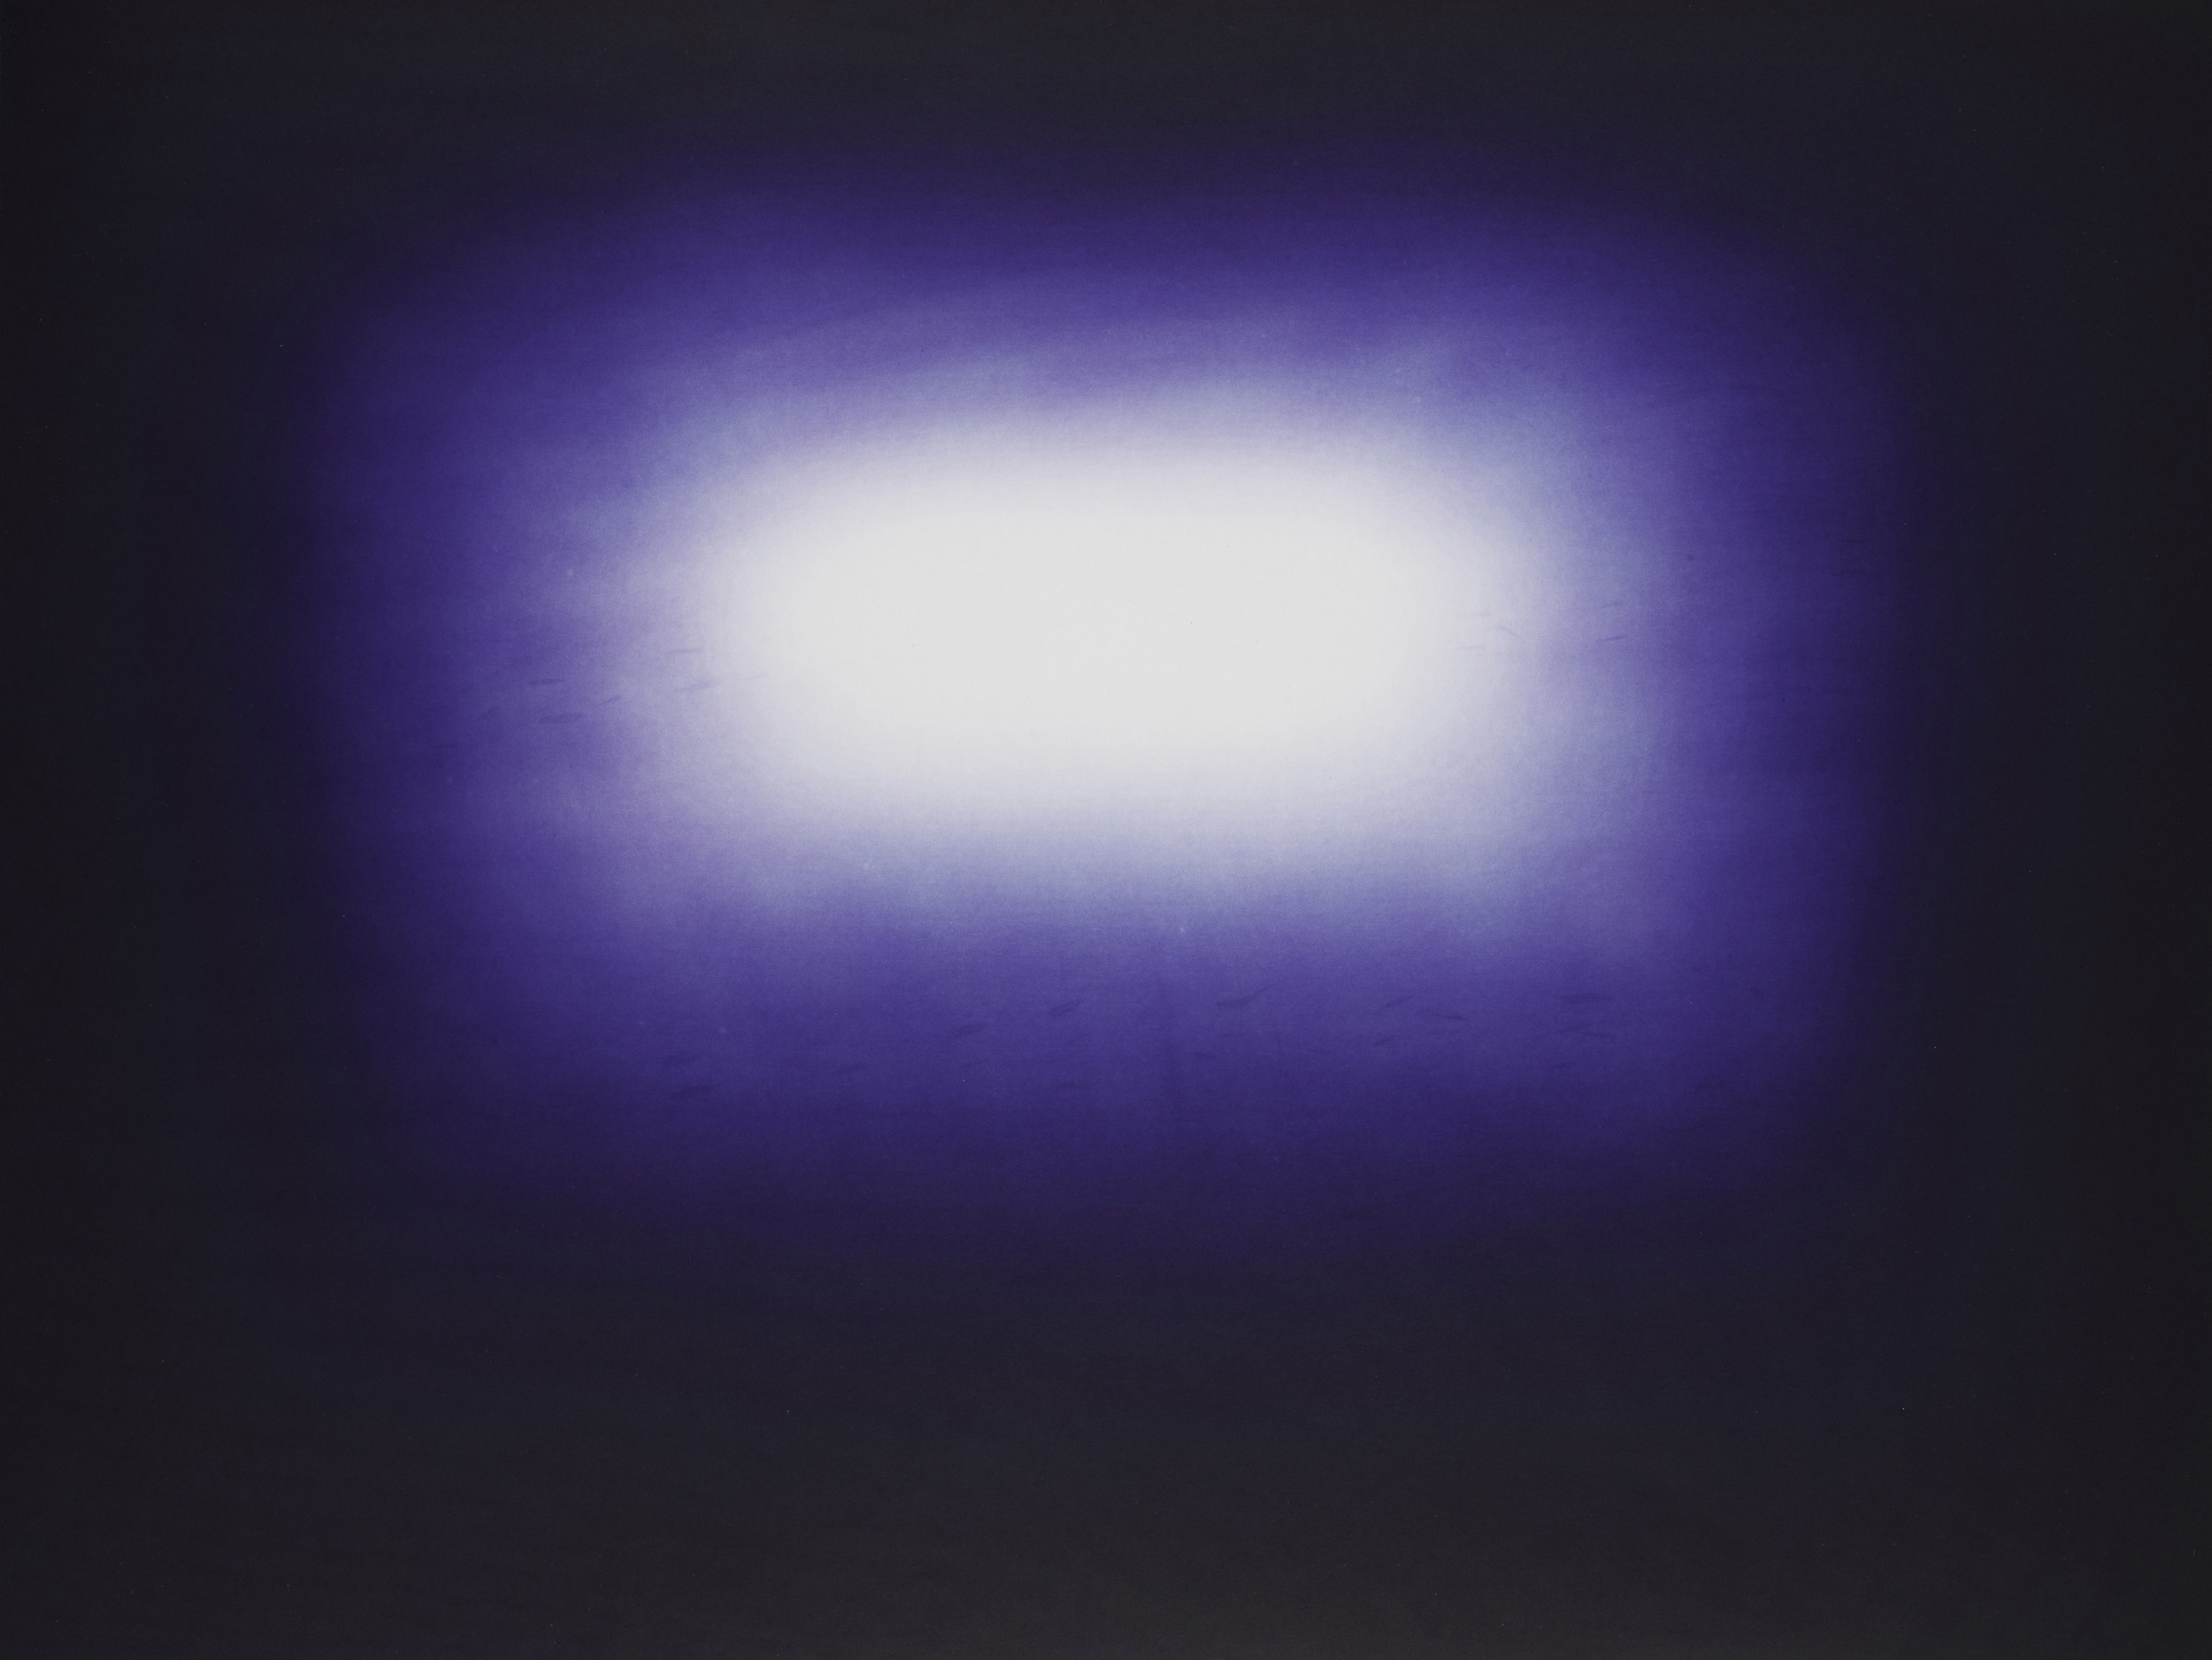 Anish Kapoor  Dark Blue • 2011 Gravura em metal Edição: 39 76.2 x 100 cm